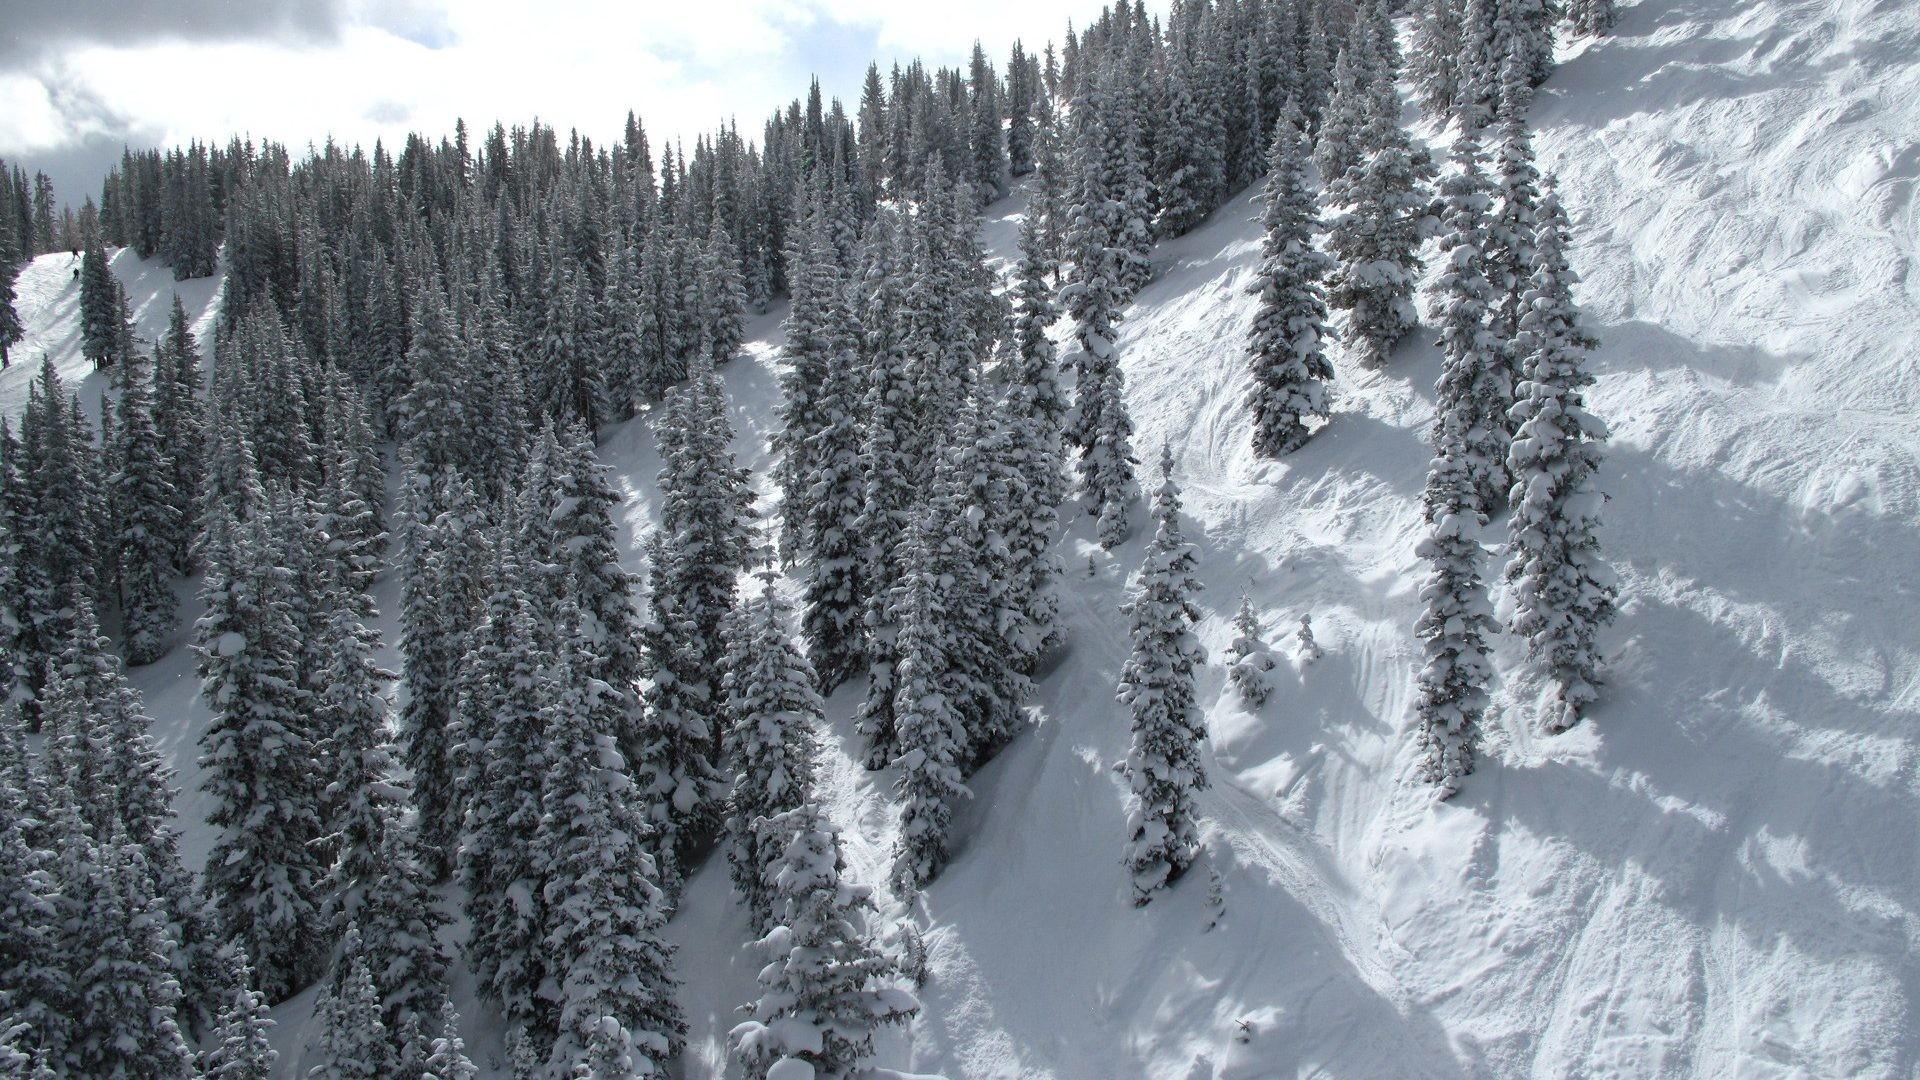 Live Snow Wallpaper (31+ Images